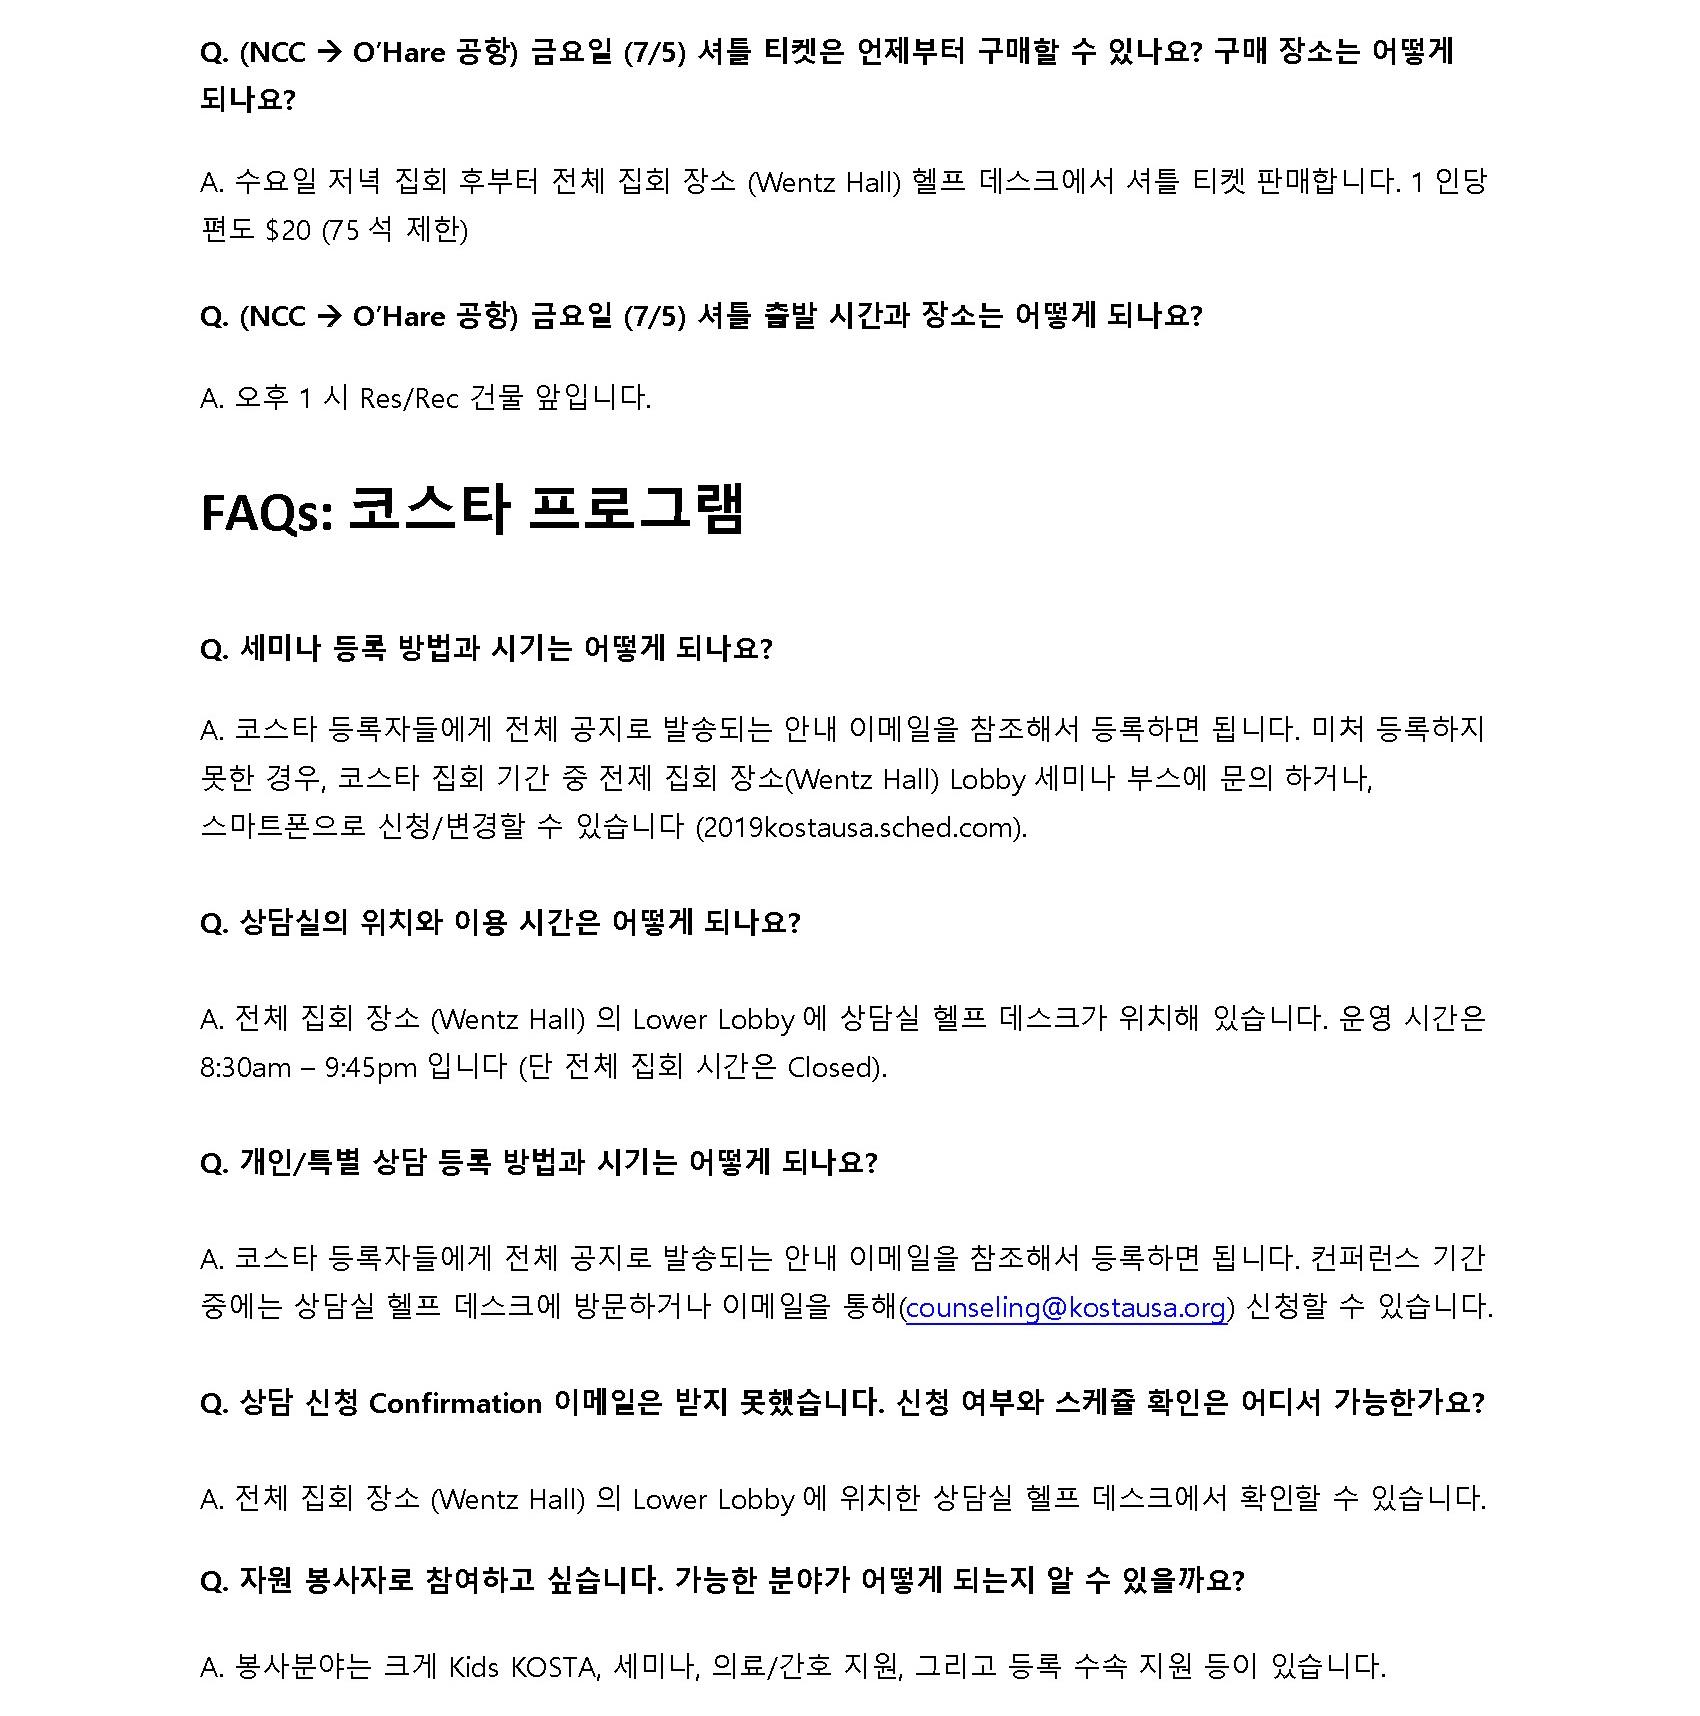 2019+KOSTA+FAQ_final+version_Page_4.jpg